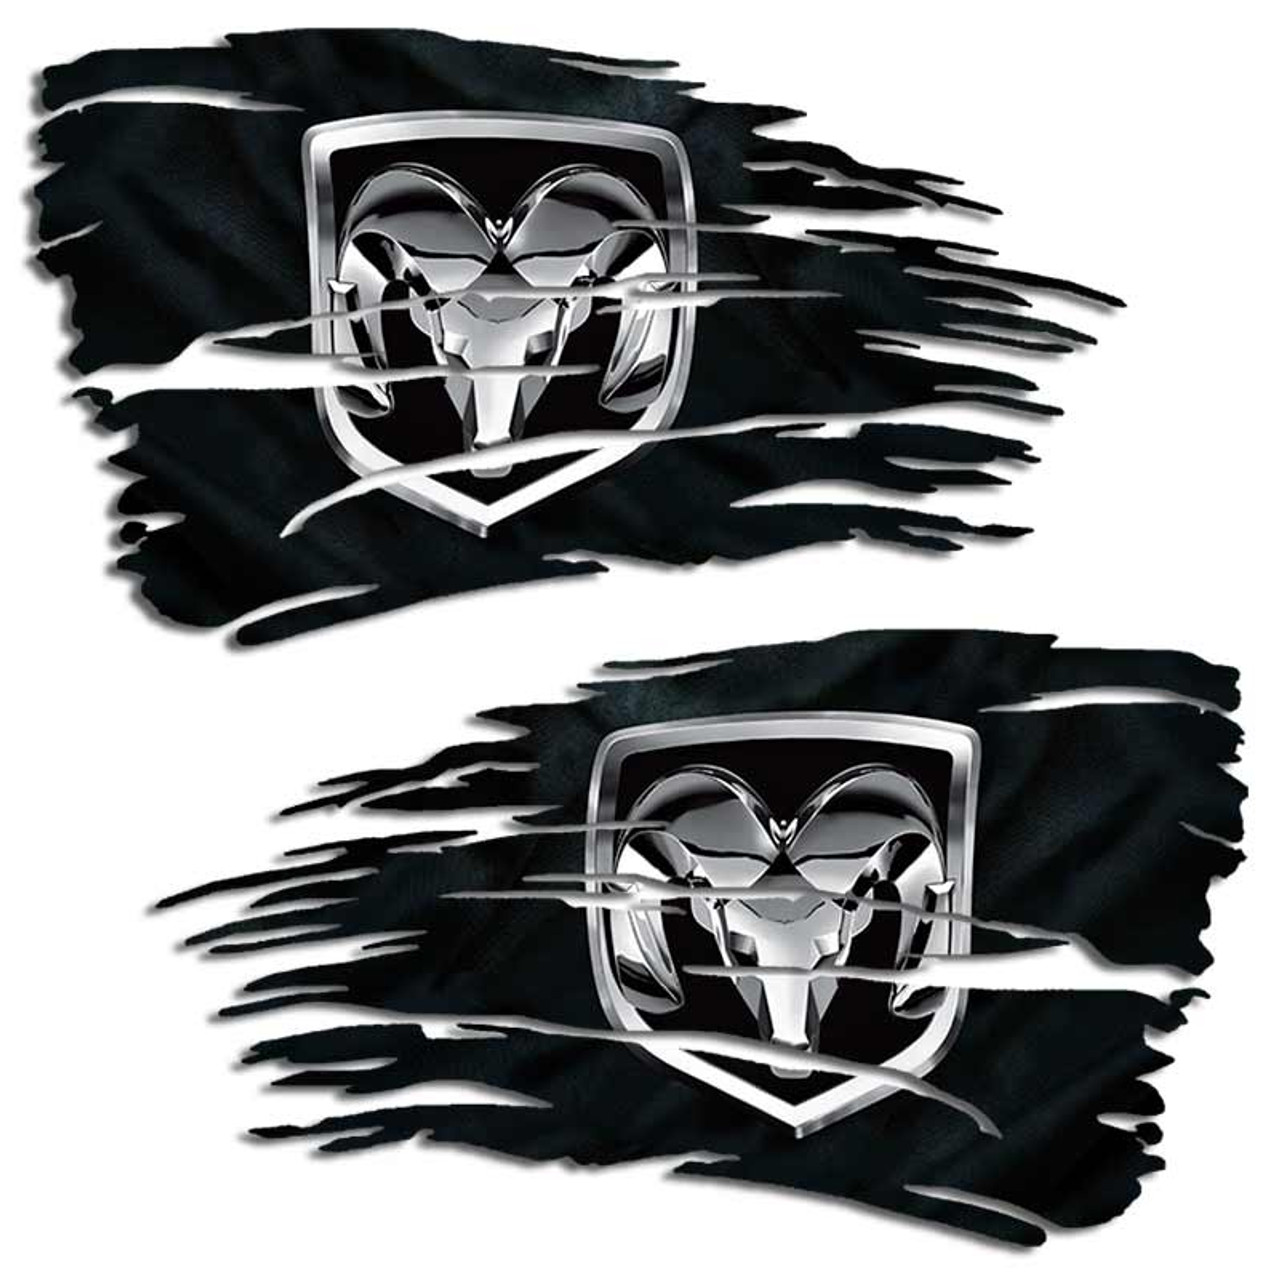 Dodge Ram 1500 2500 Mopar Hemi Distressed Flag Decal